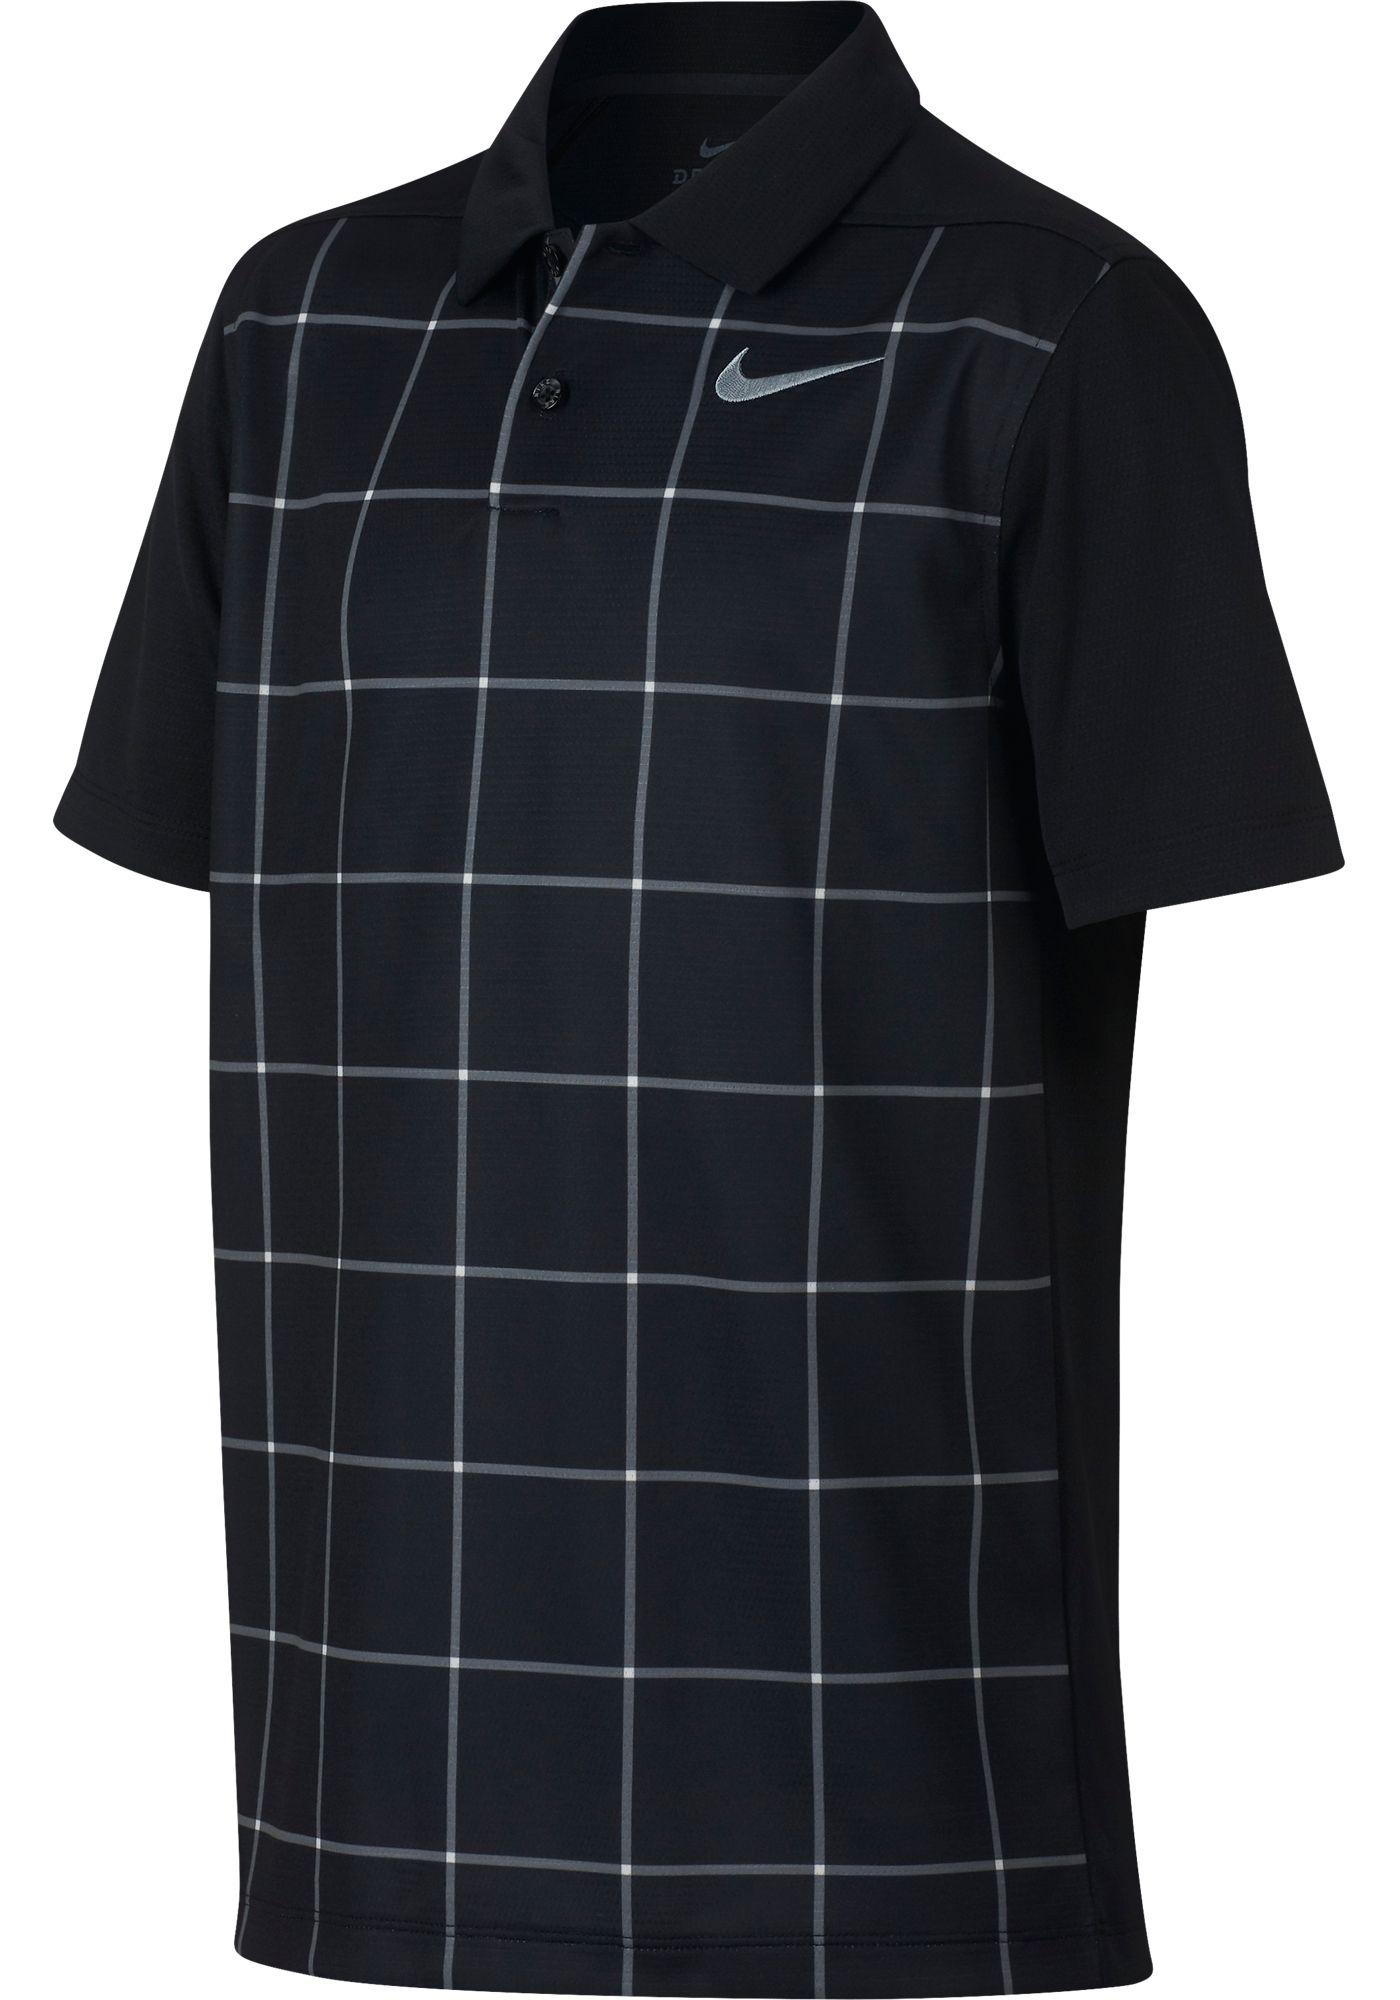 Nike Boys' Dry Grid Print Golf Polo